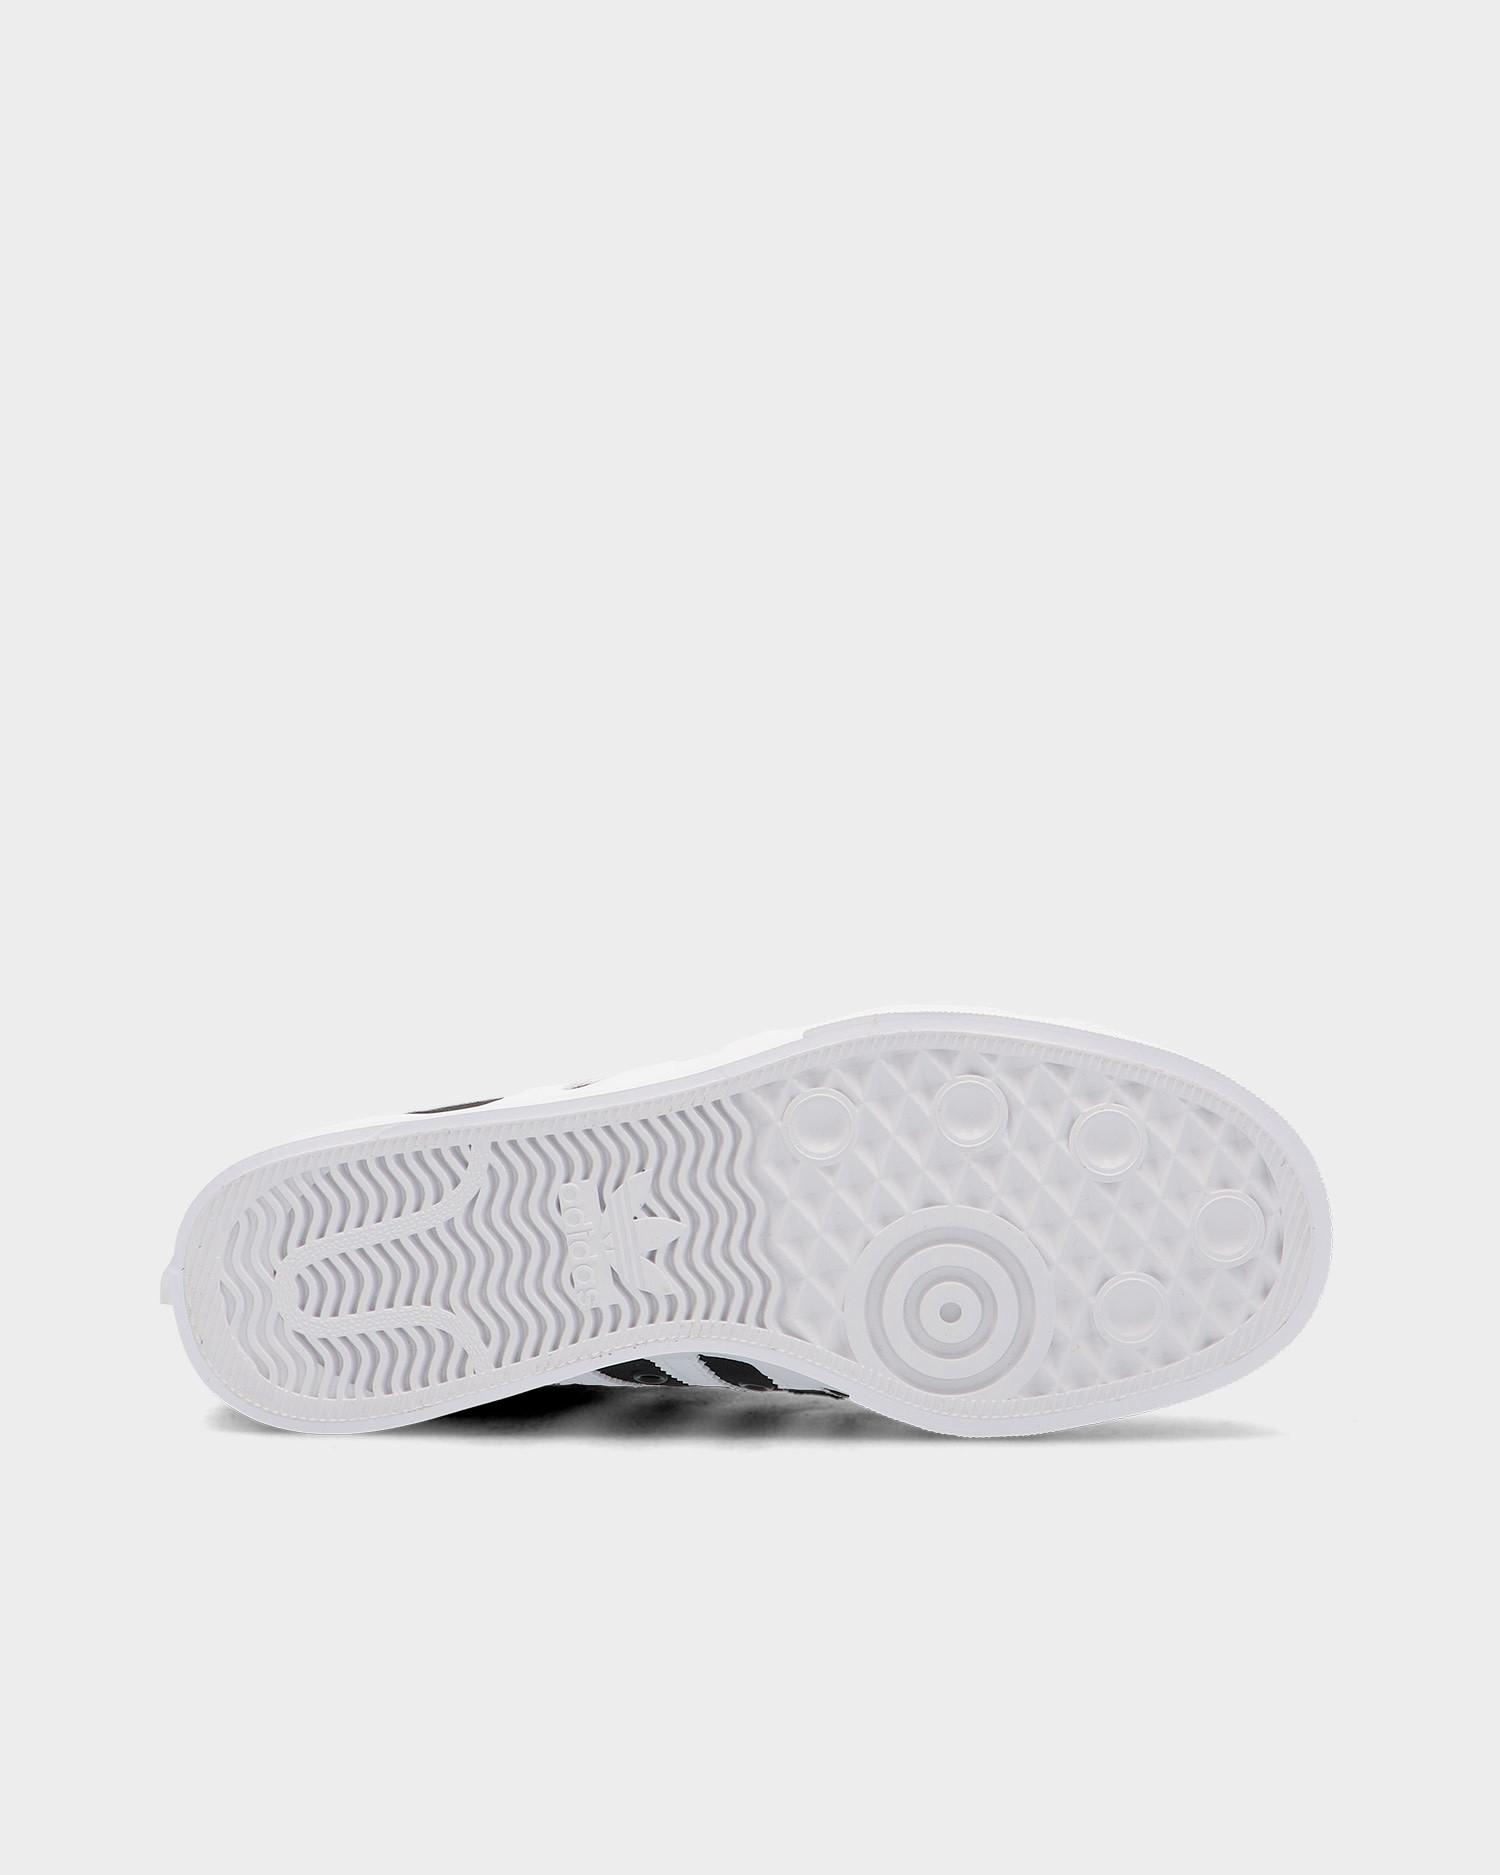 Adidas Nizza Platform Mid Cblack/Ftwwht/Ftwwht